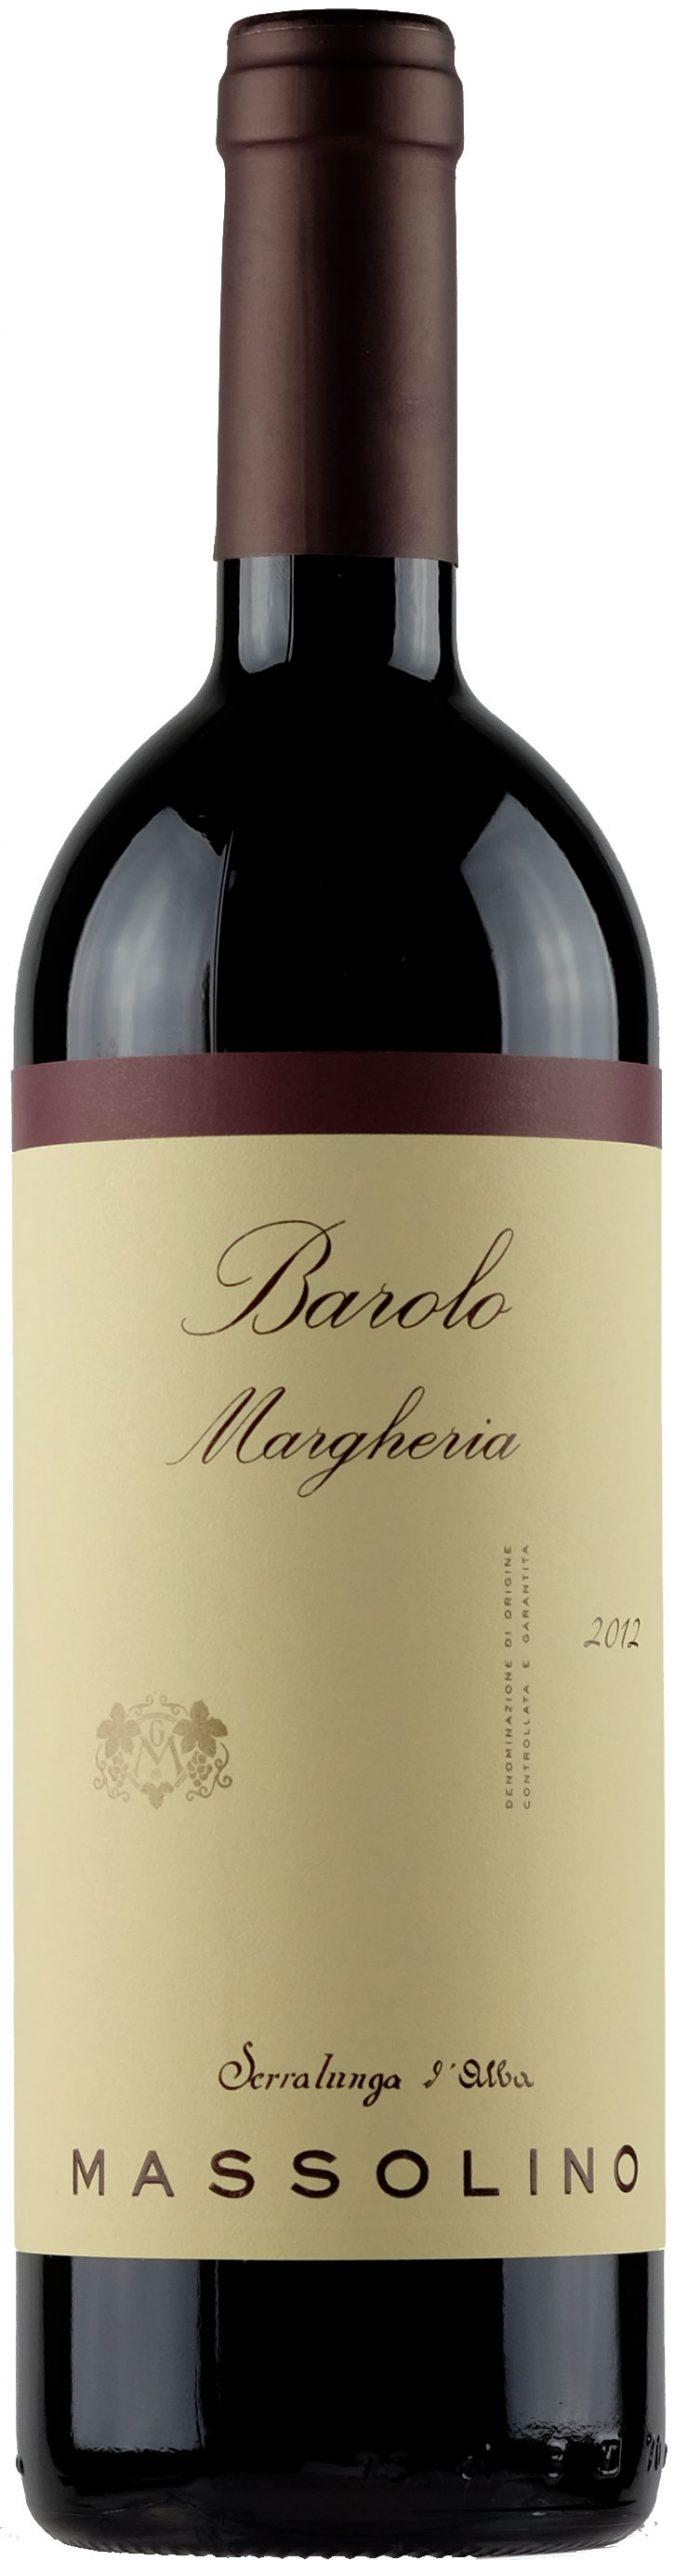 _Massolino Barolo Margheria_2012